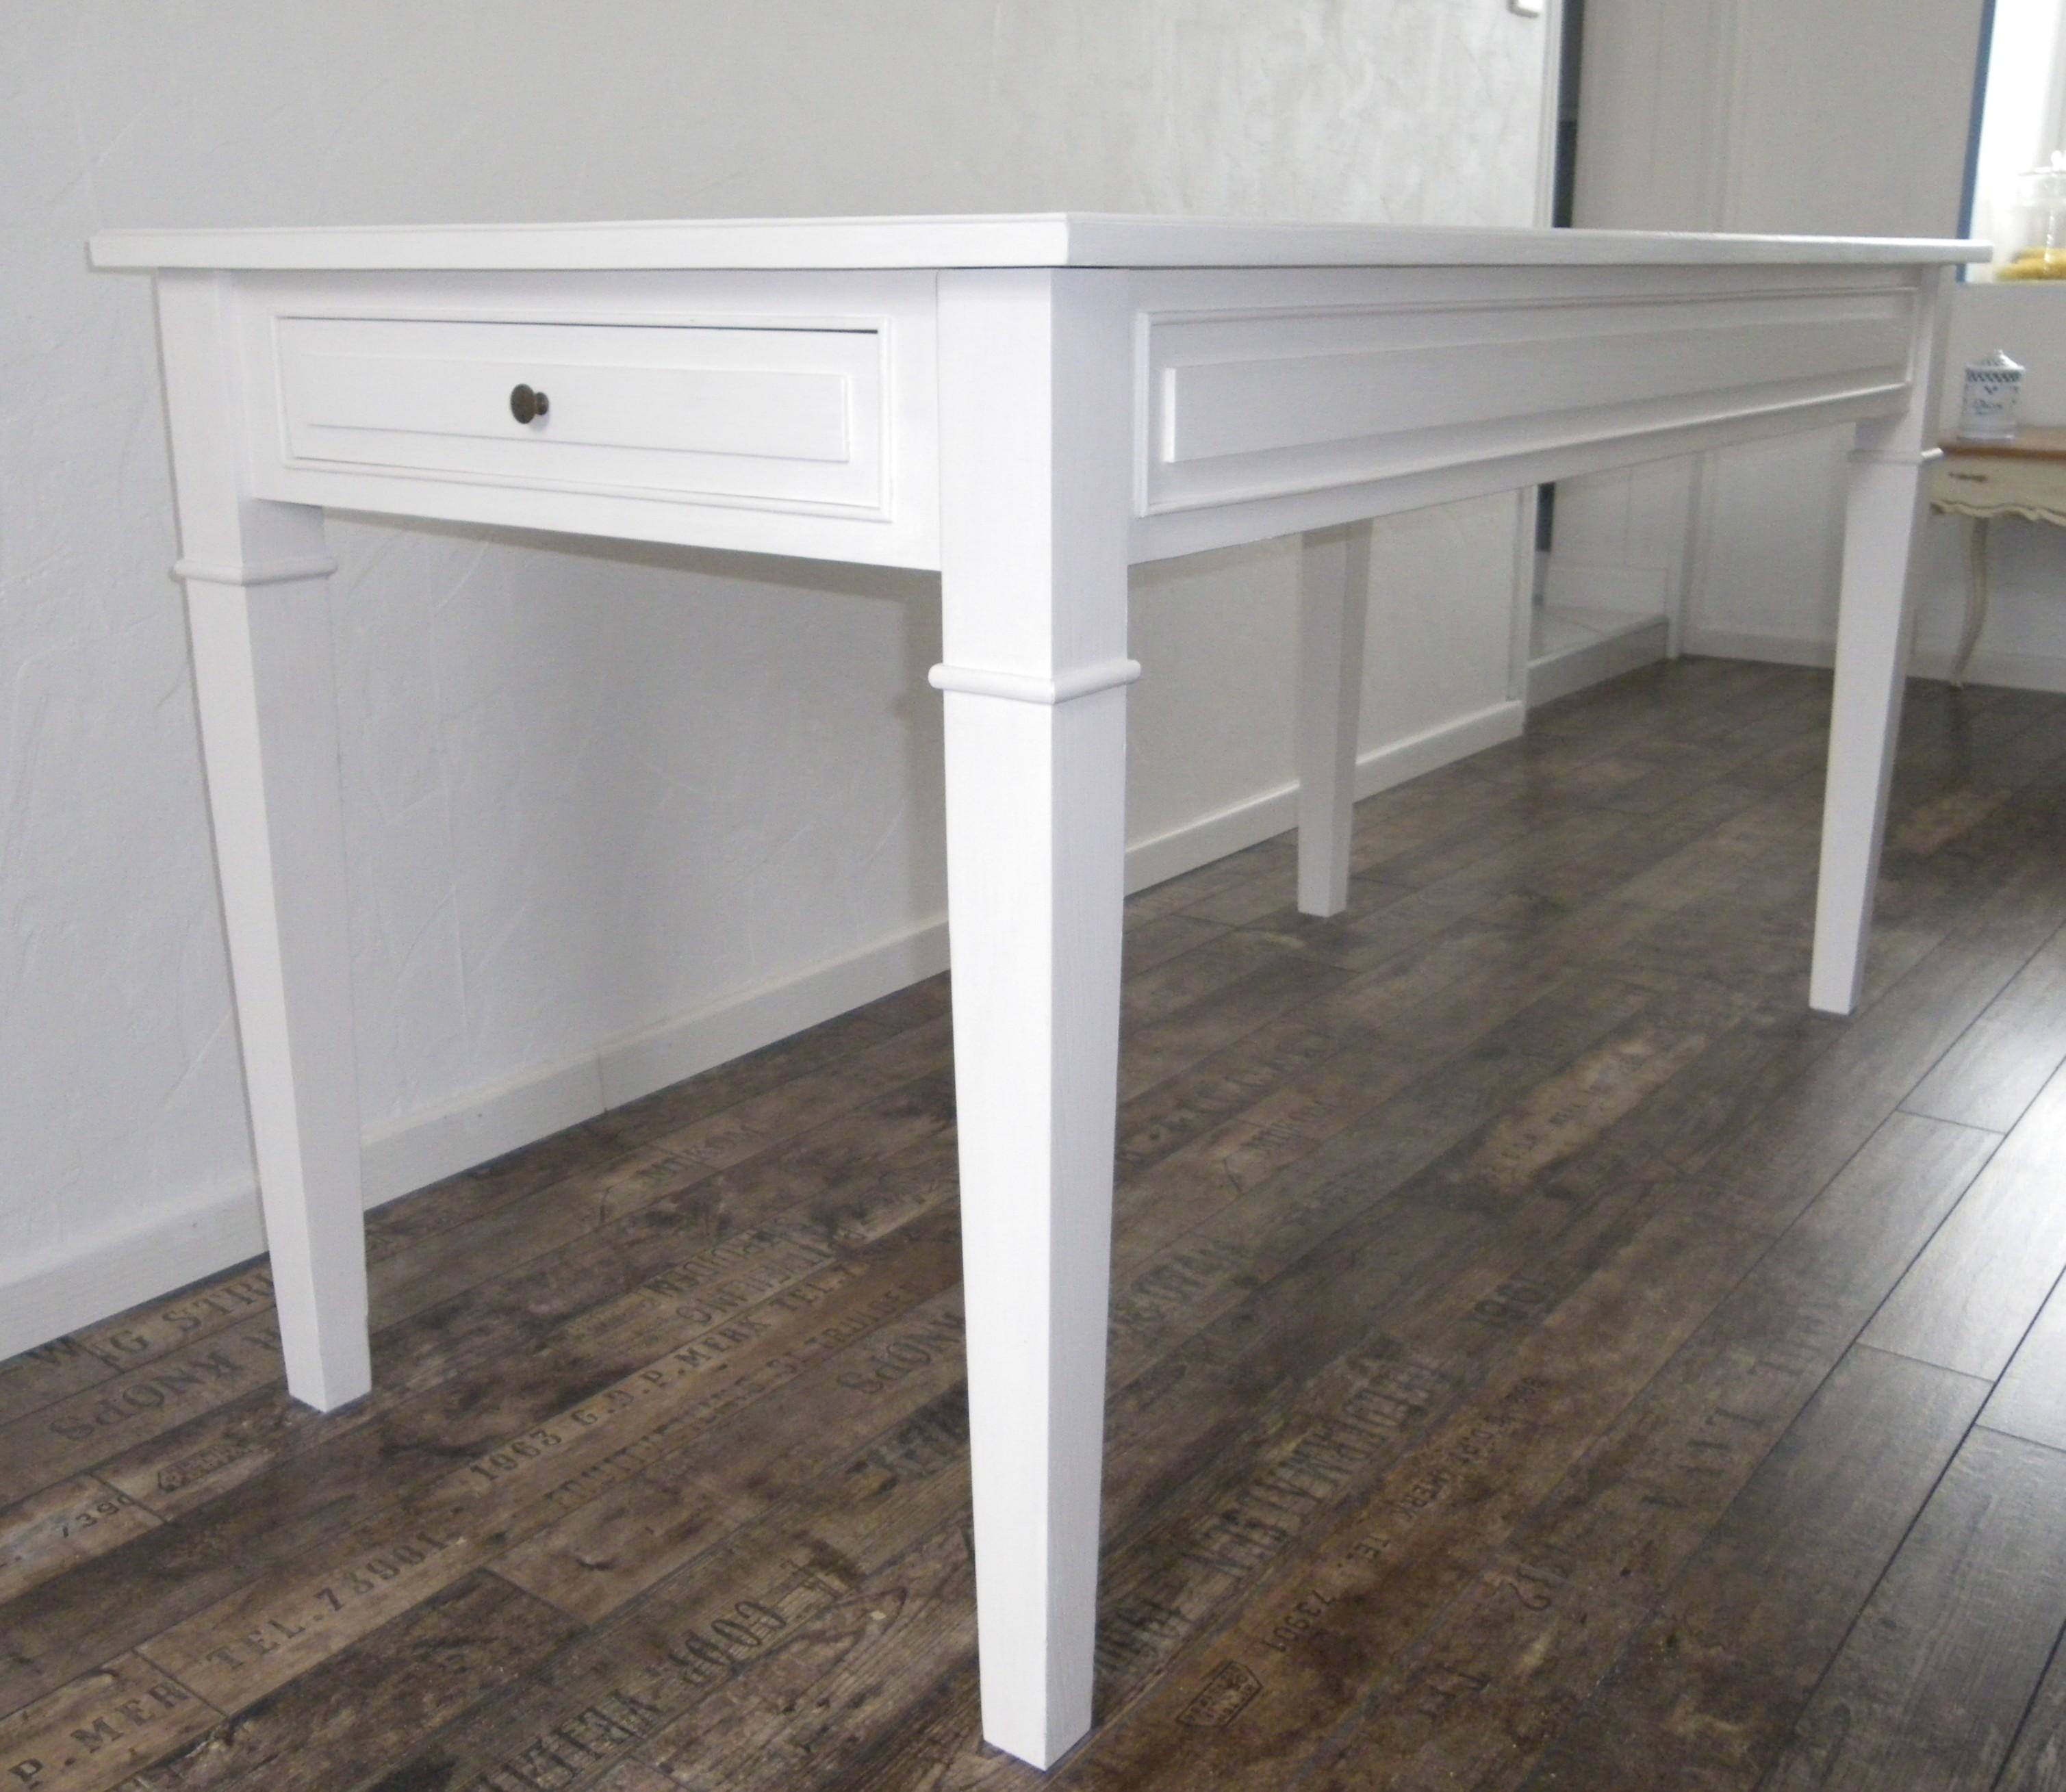 Table de cuisine salle manger peinte blanche anjoudeco for Table salle a manger ancienne